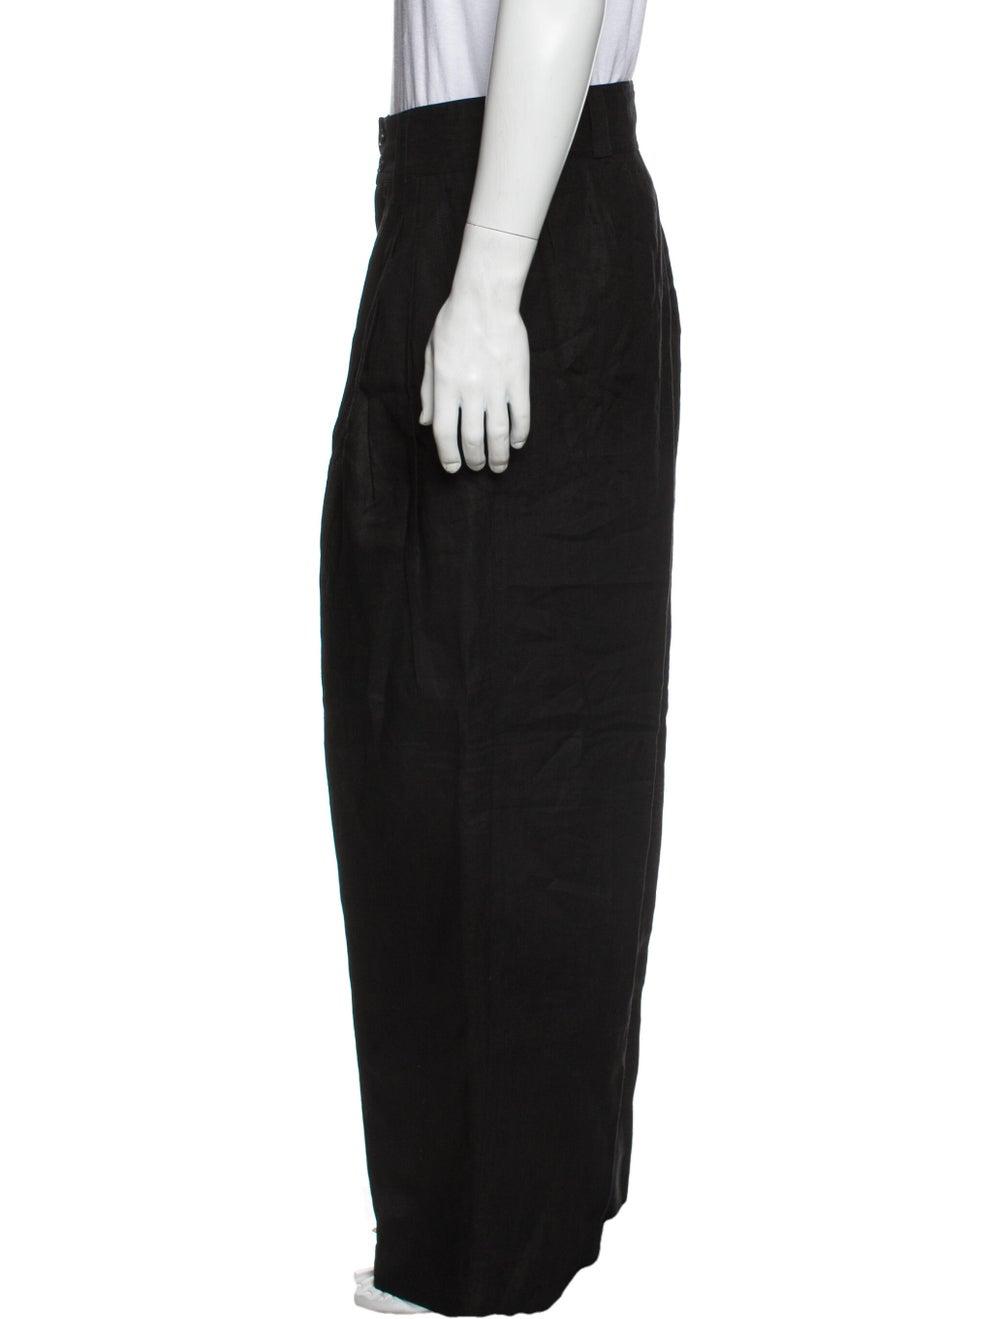 Gianni Versace Vintage Pants Black - image 2